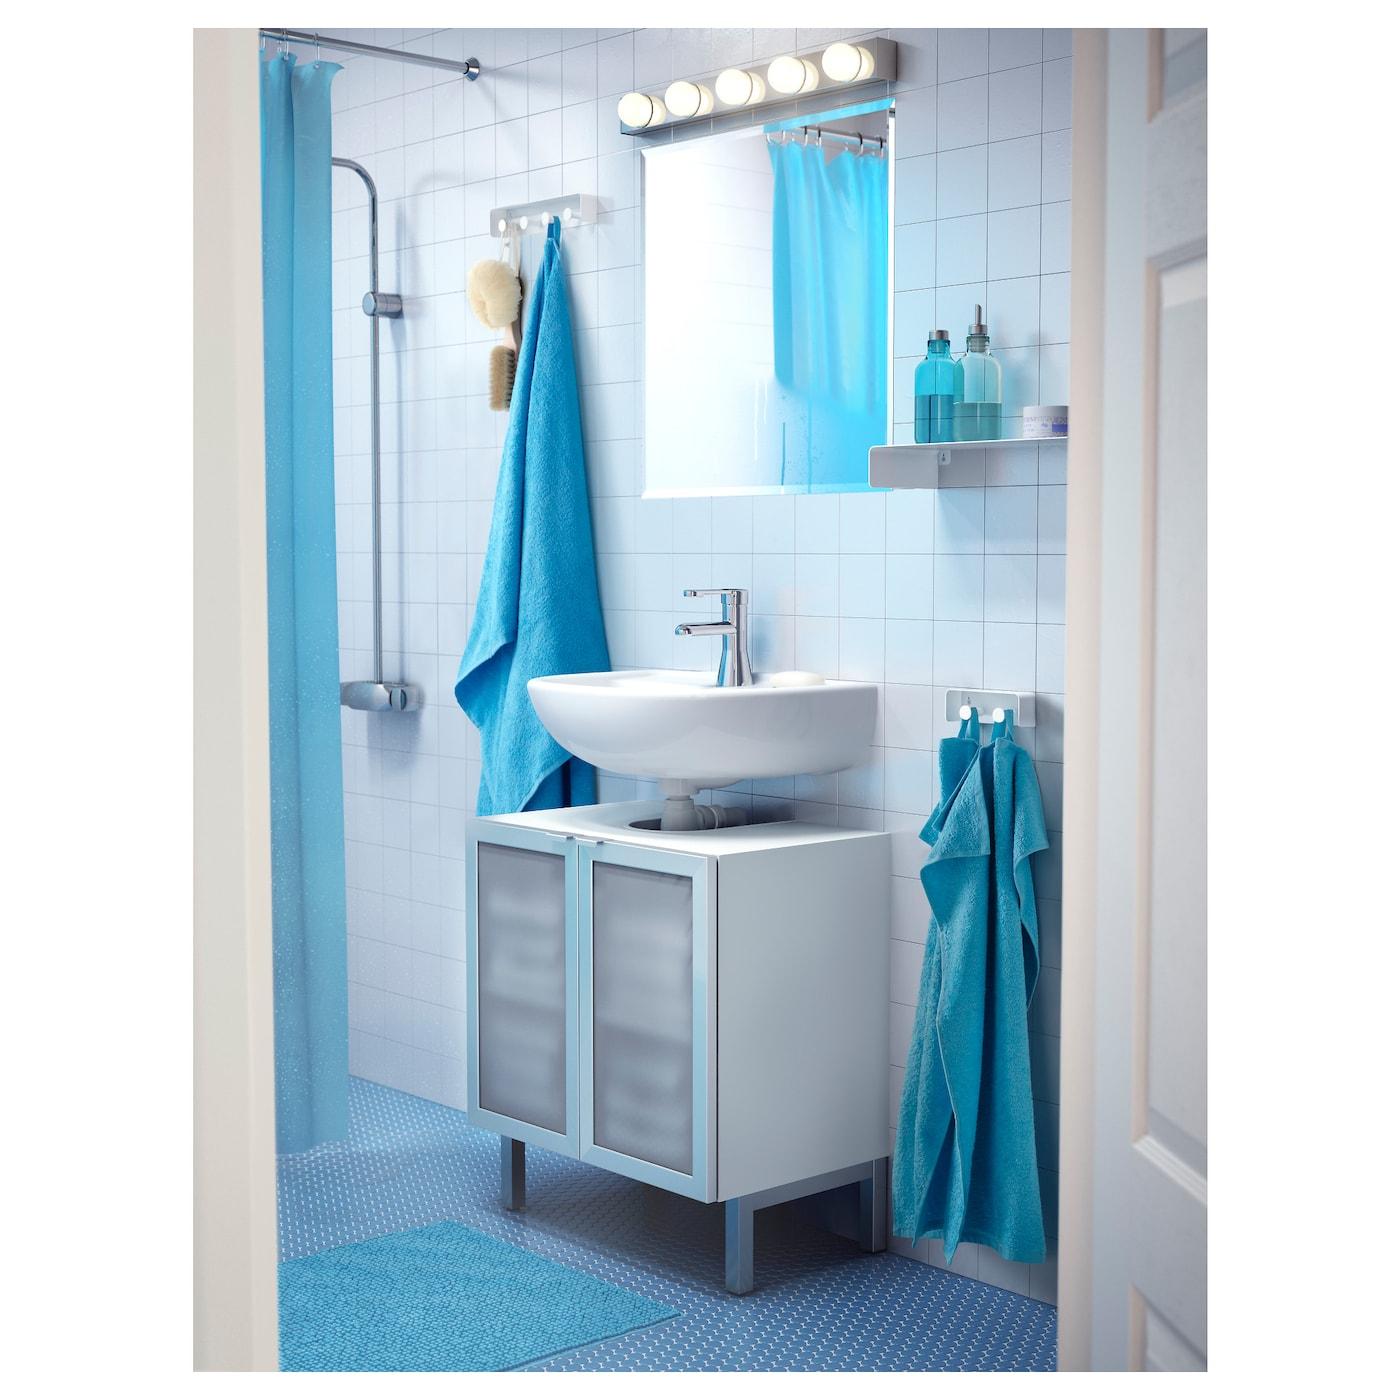 IKEA ENUDDEN Towel Rack